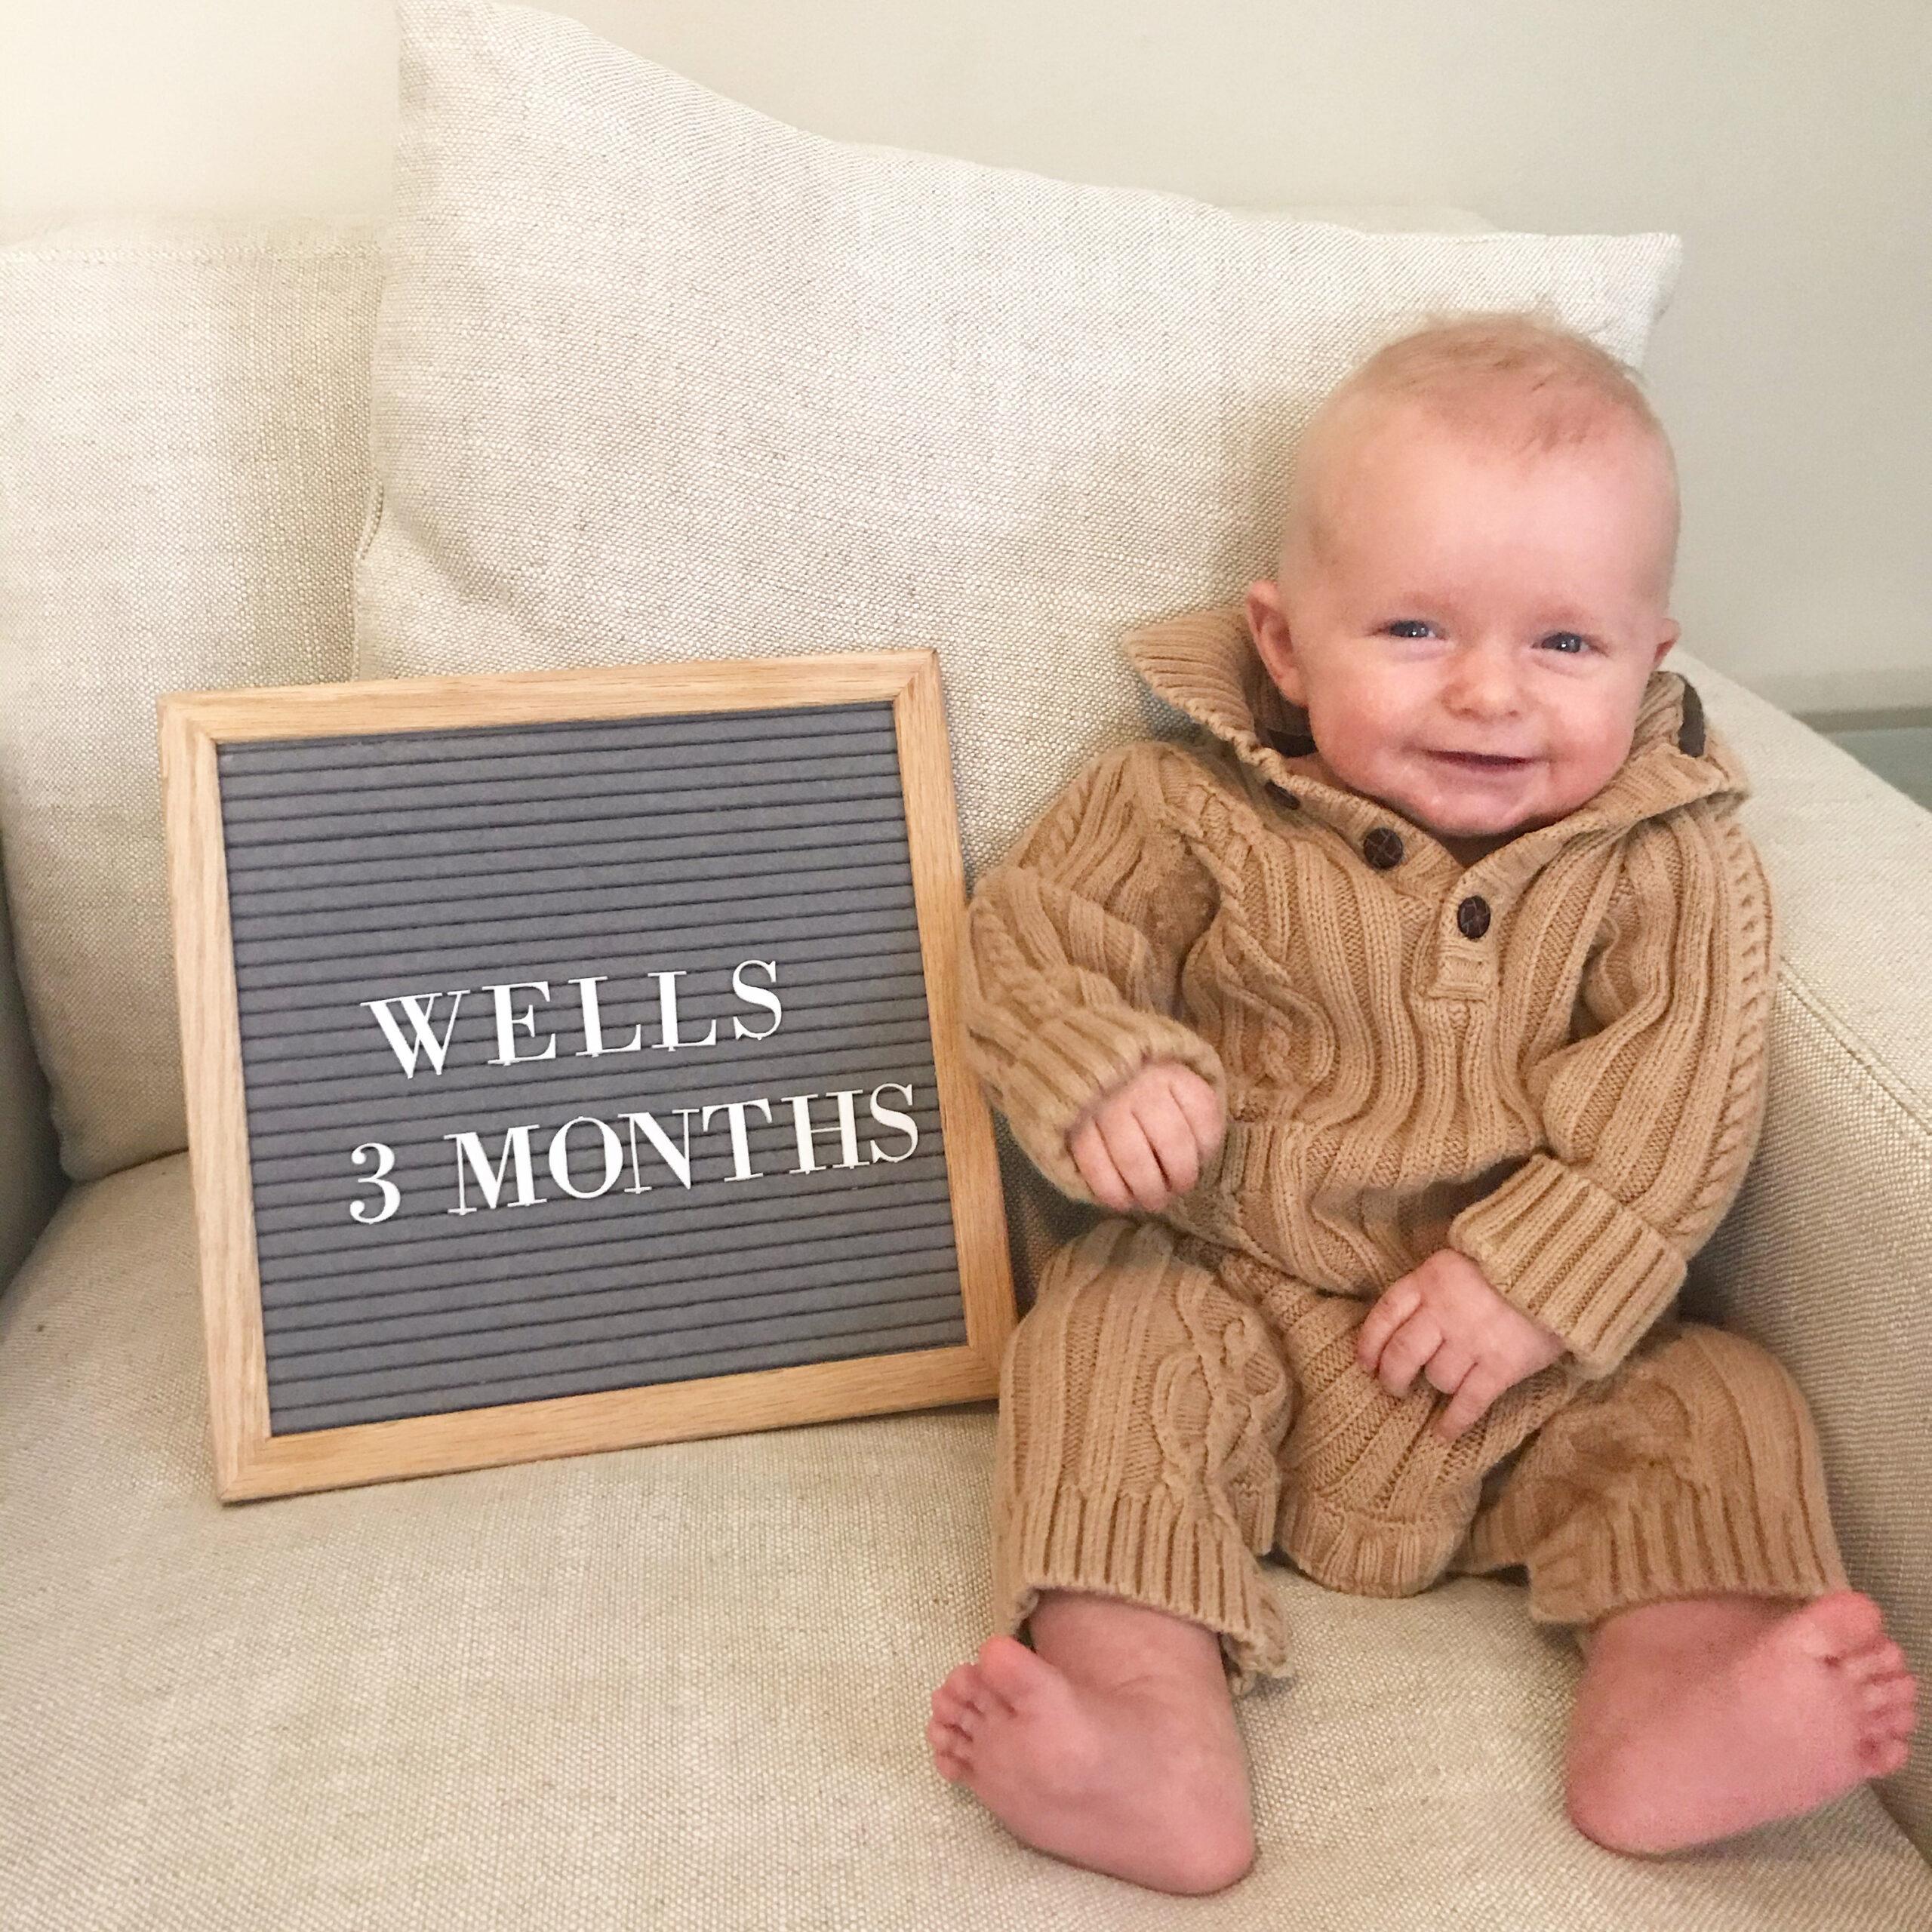 wells 3 months!